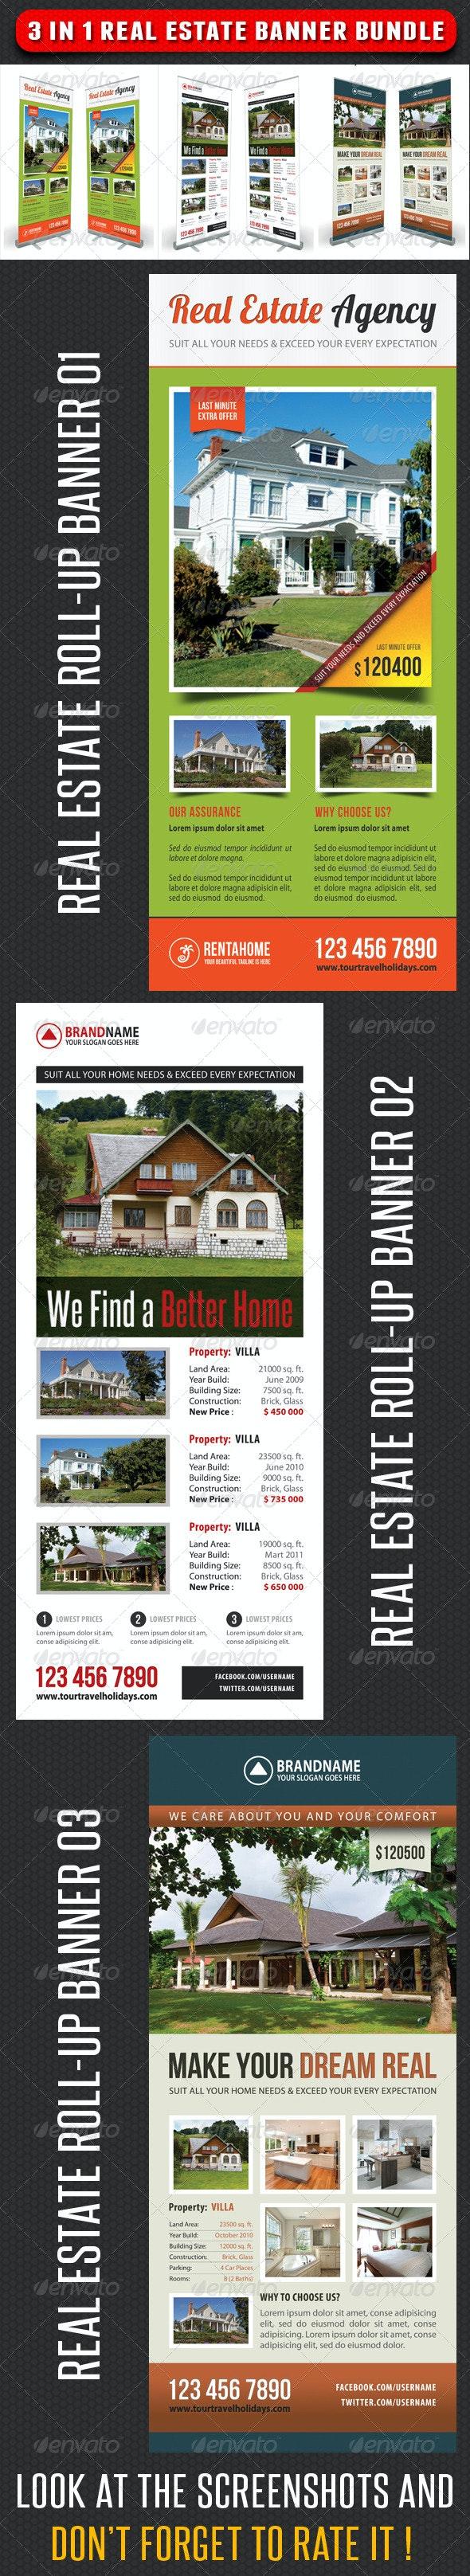 3 in 1 Real Estate Banner Bundle 02 - Signage Print Templates